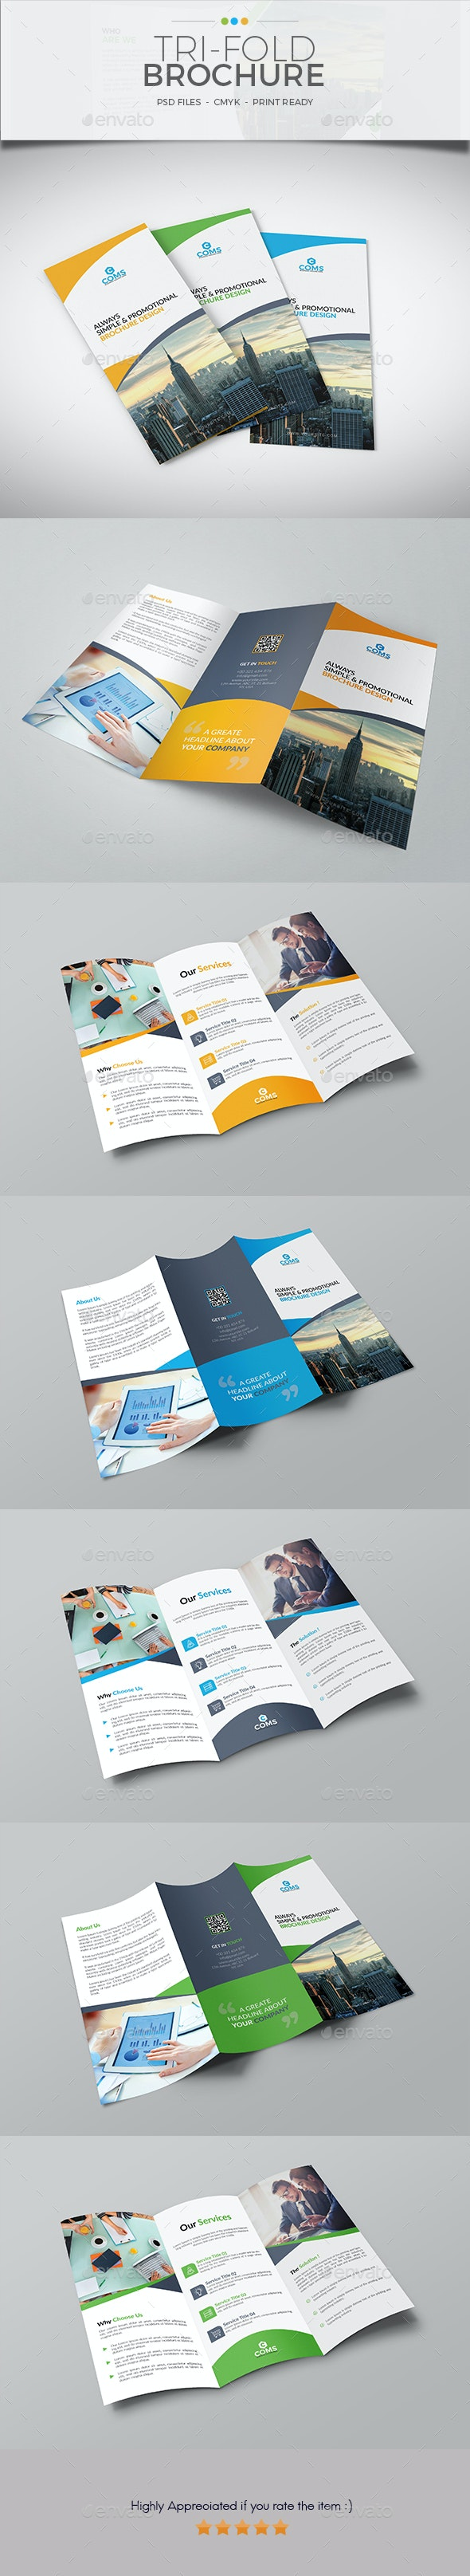 Trifold Brochure Template 12 - Corporate Brochures